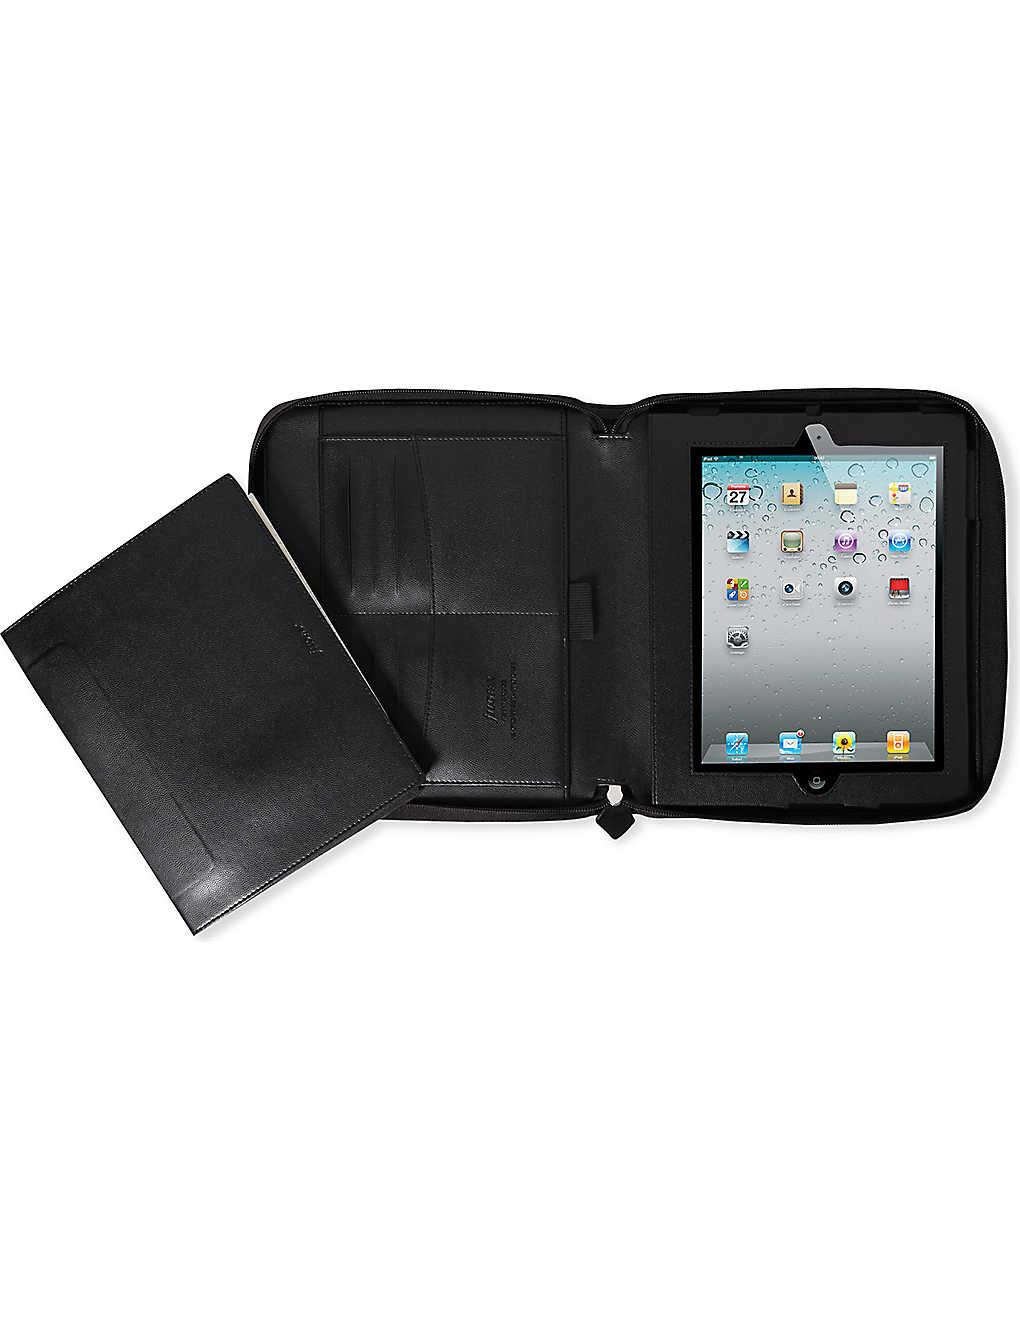 FILOFAX Pennybridge A5 personal organiser and iPad holder